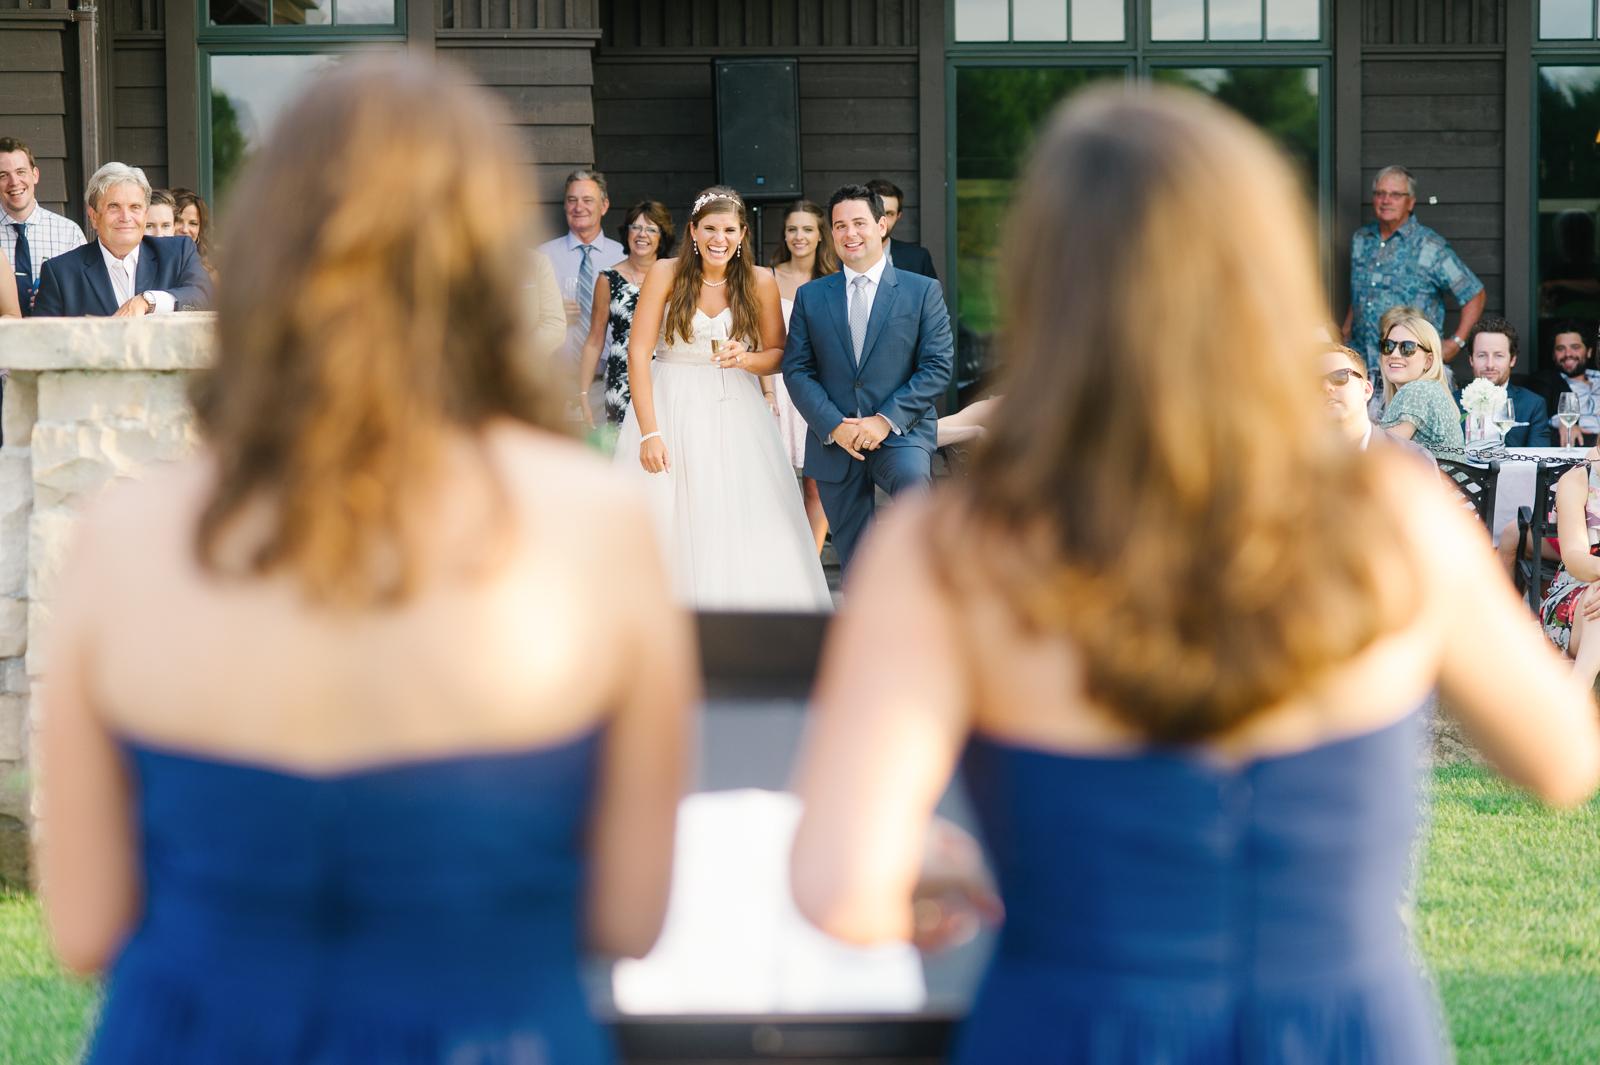 tara mcmullen photography muskoka wedding photographer st peters on the rock wedding photos muskoka wedding photos where to get married in muskoka camp ooch wedding-063